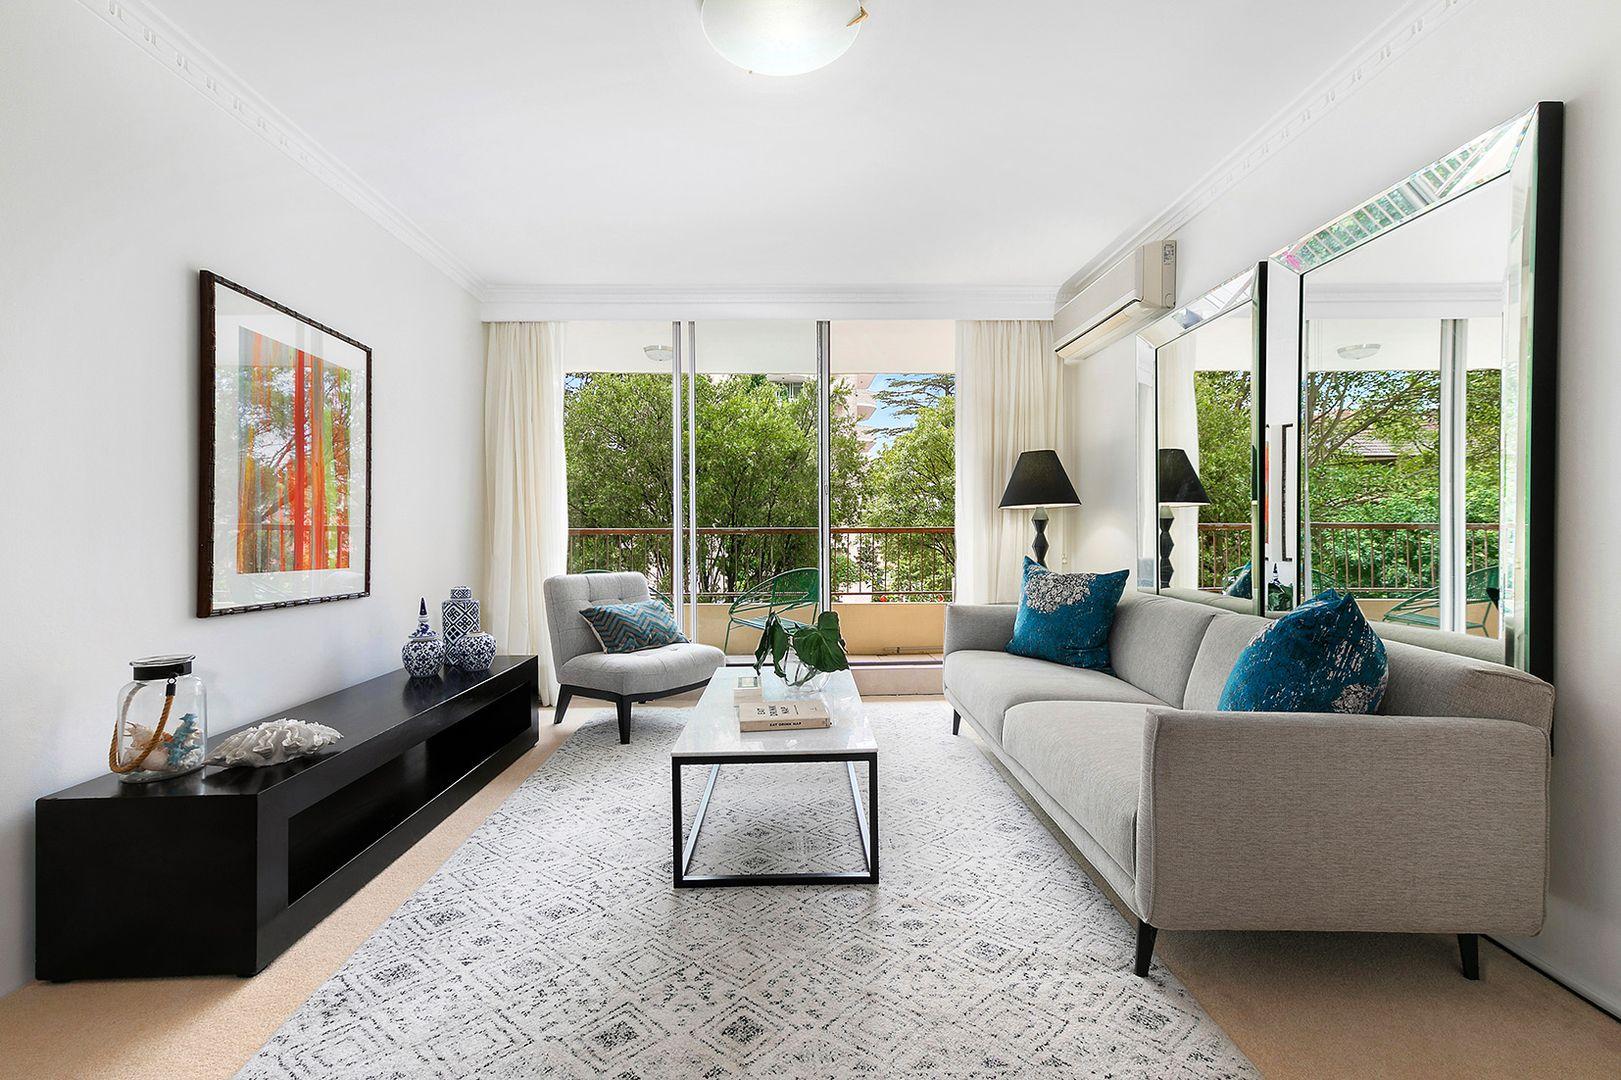 1E/8-12 Sutherland Street, Chatswood NSW 2067, Image 0